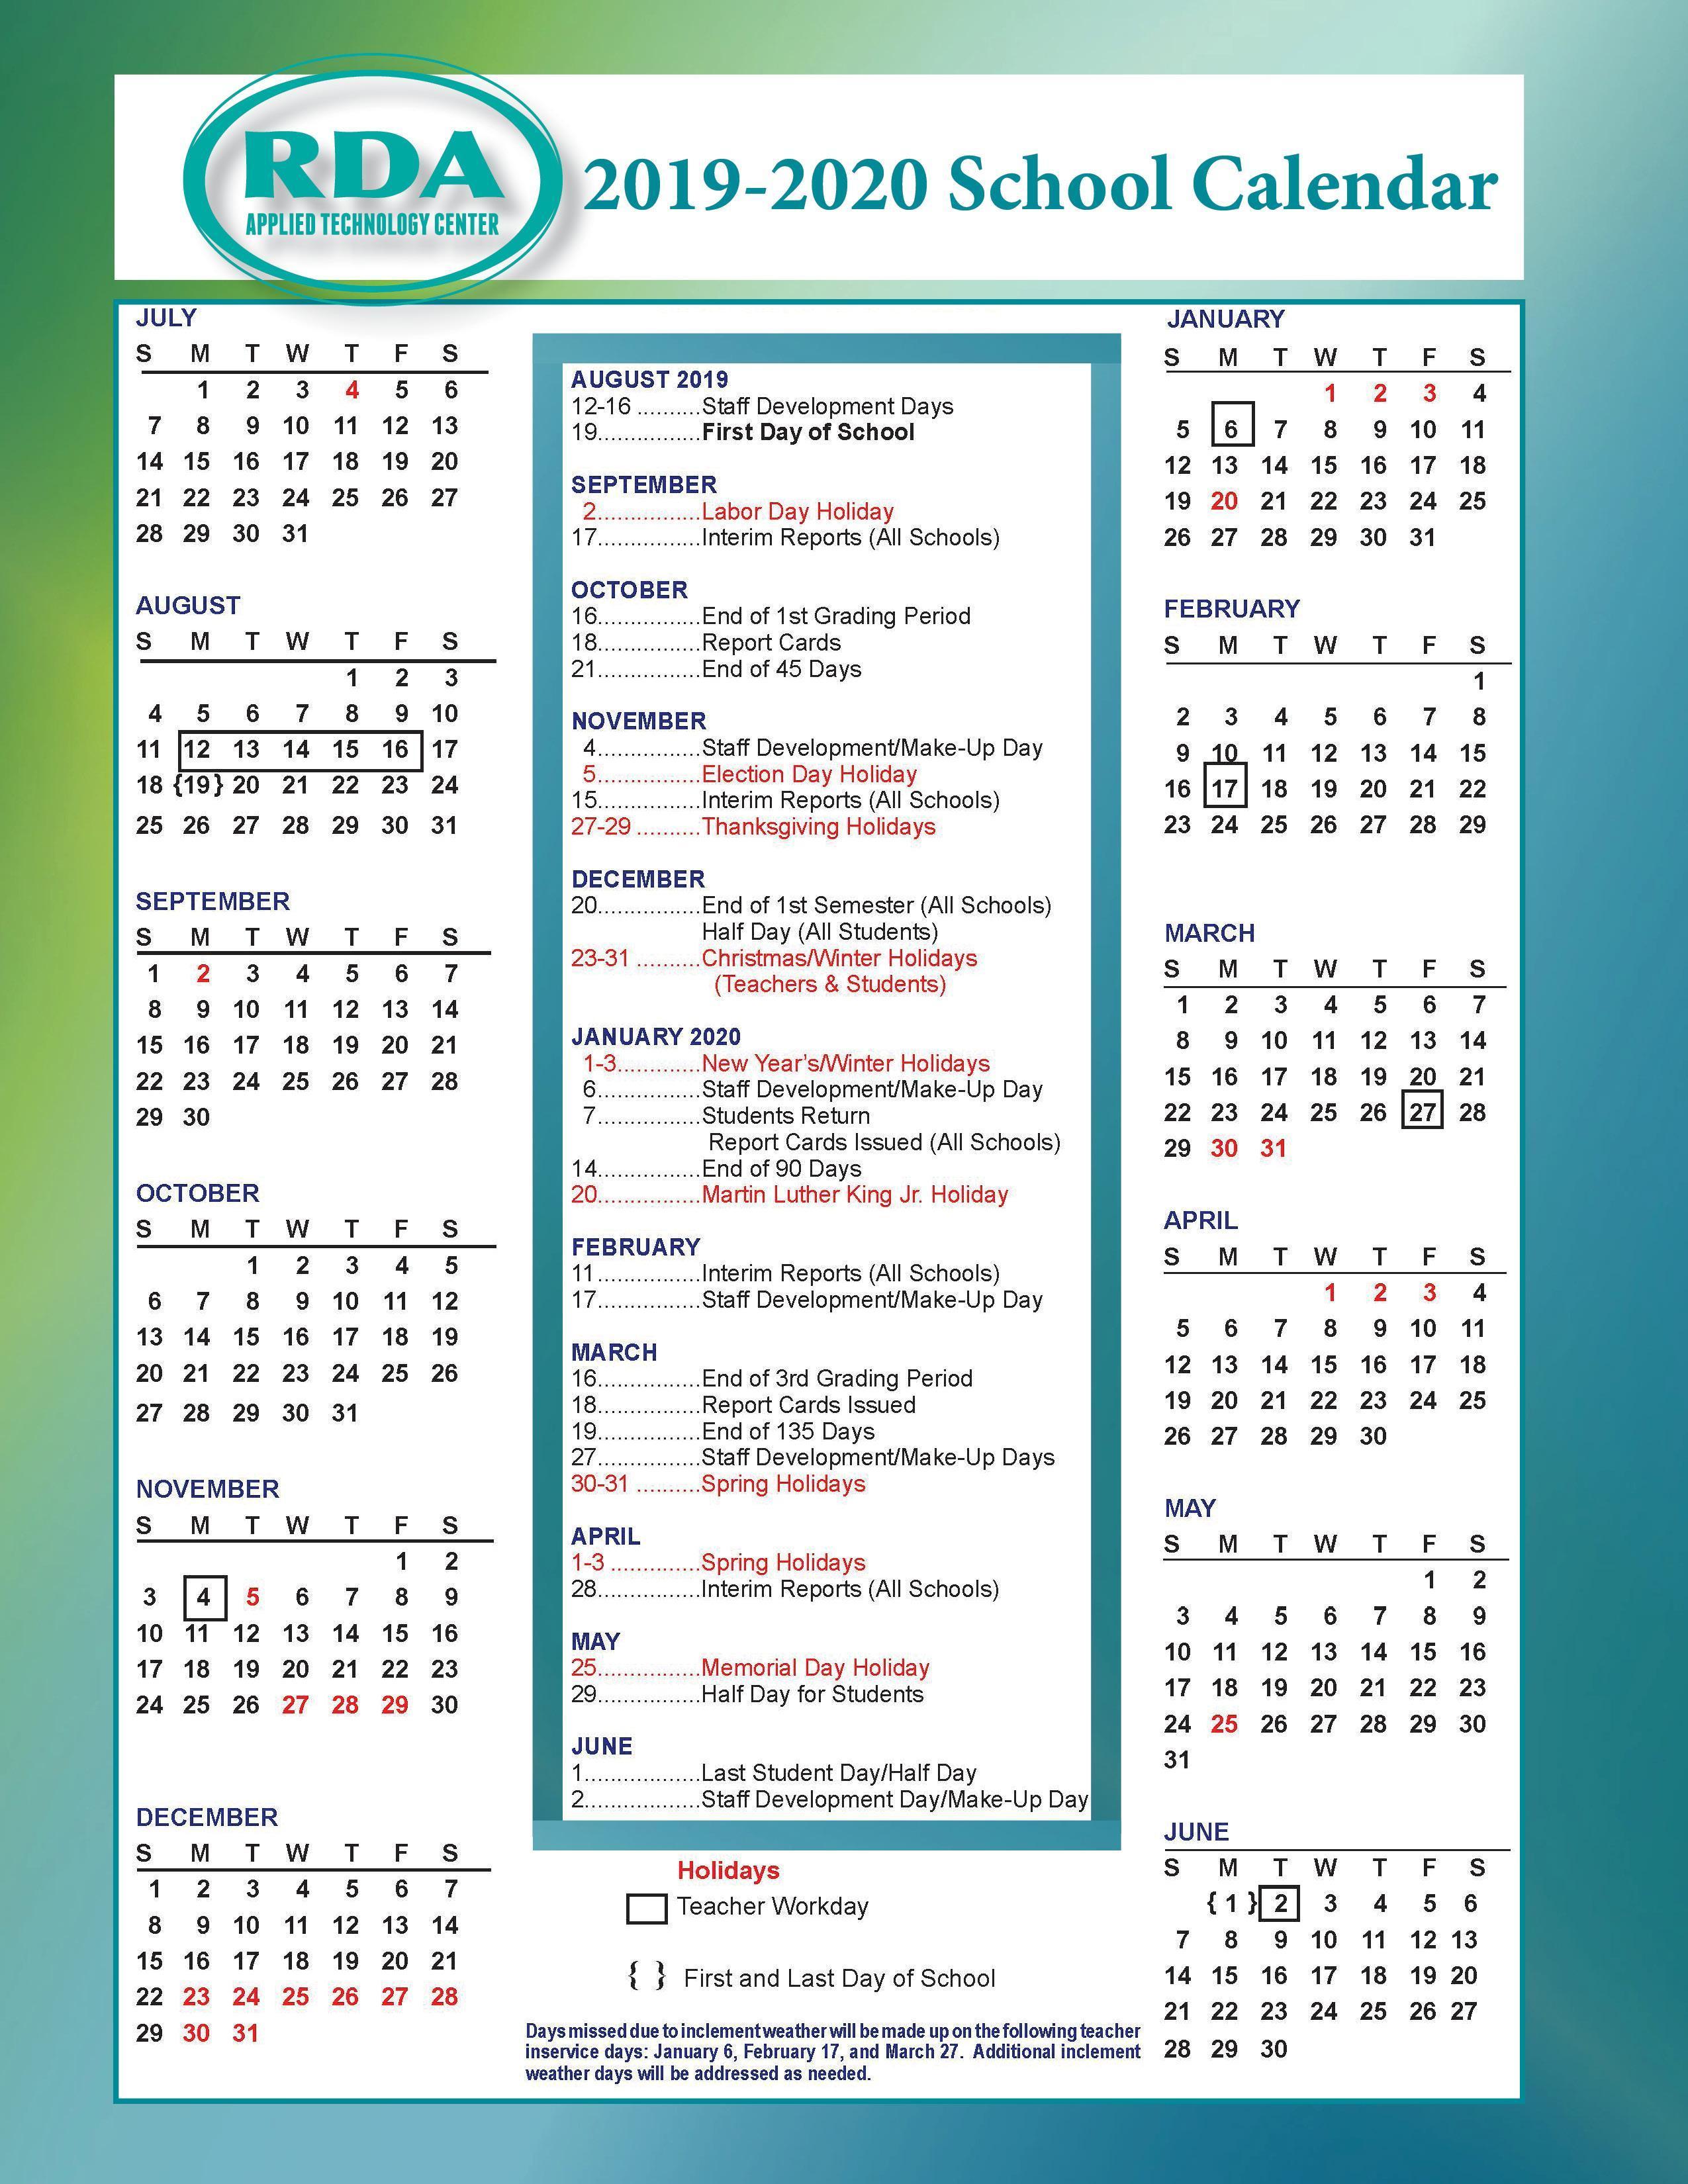 School Calendars – Parentstudent Resources – Rd Anderson Atc intended for Tl Hanna School Calendar